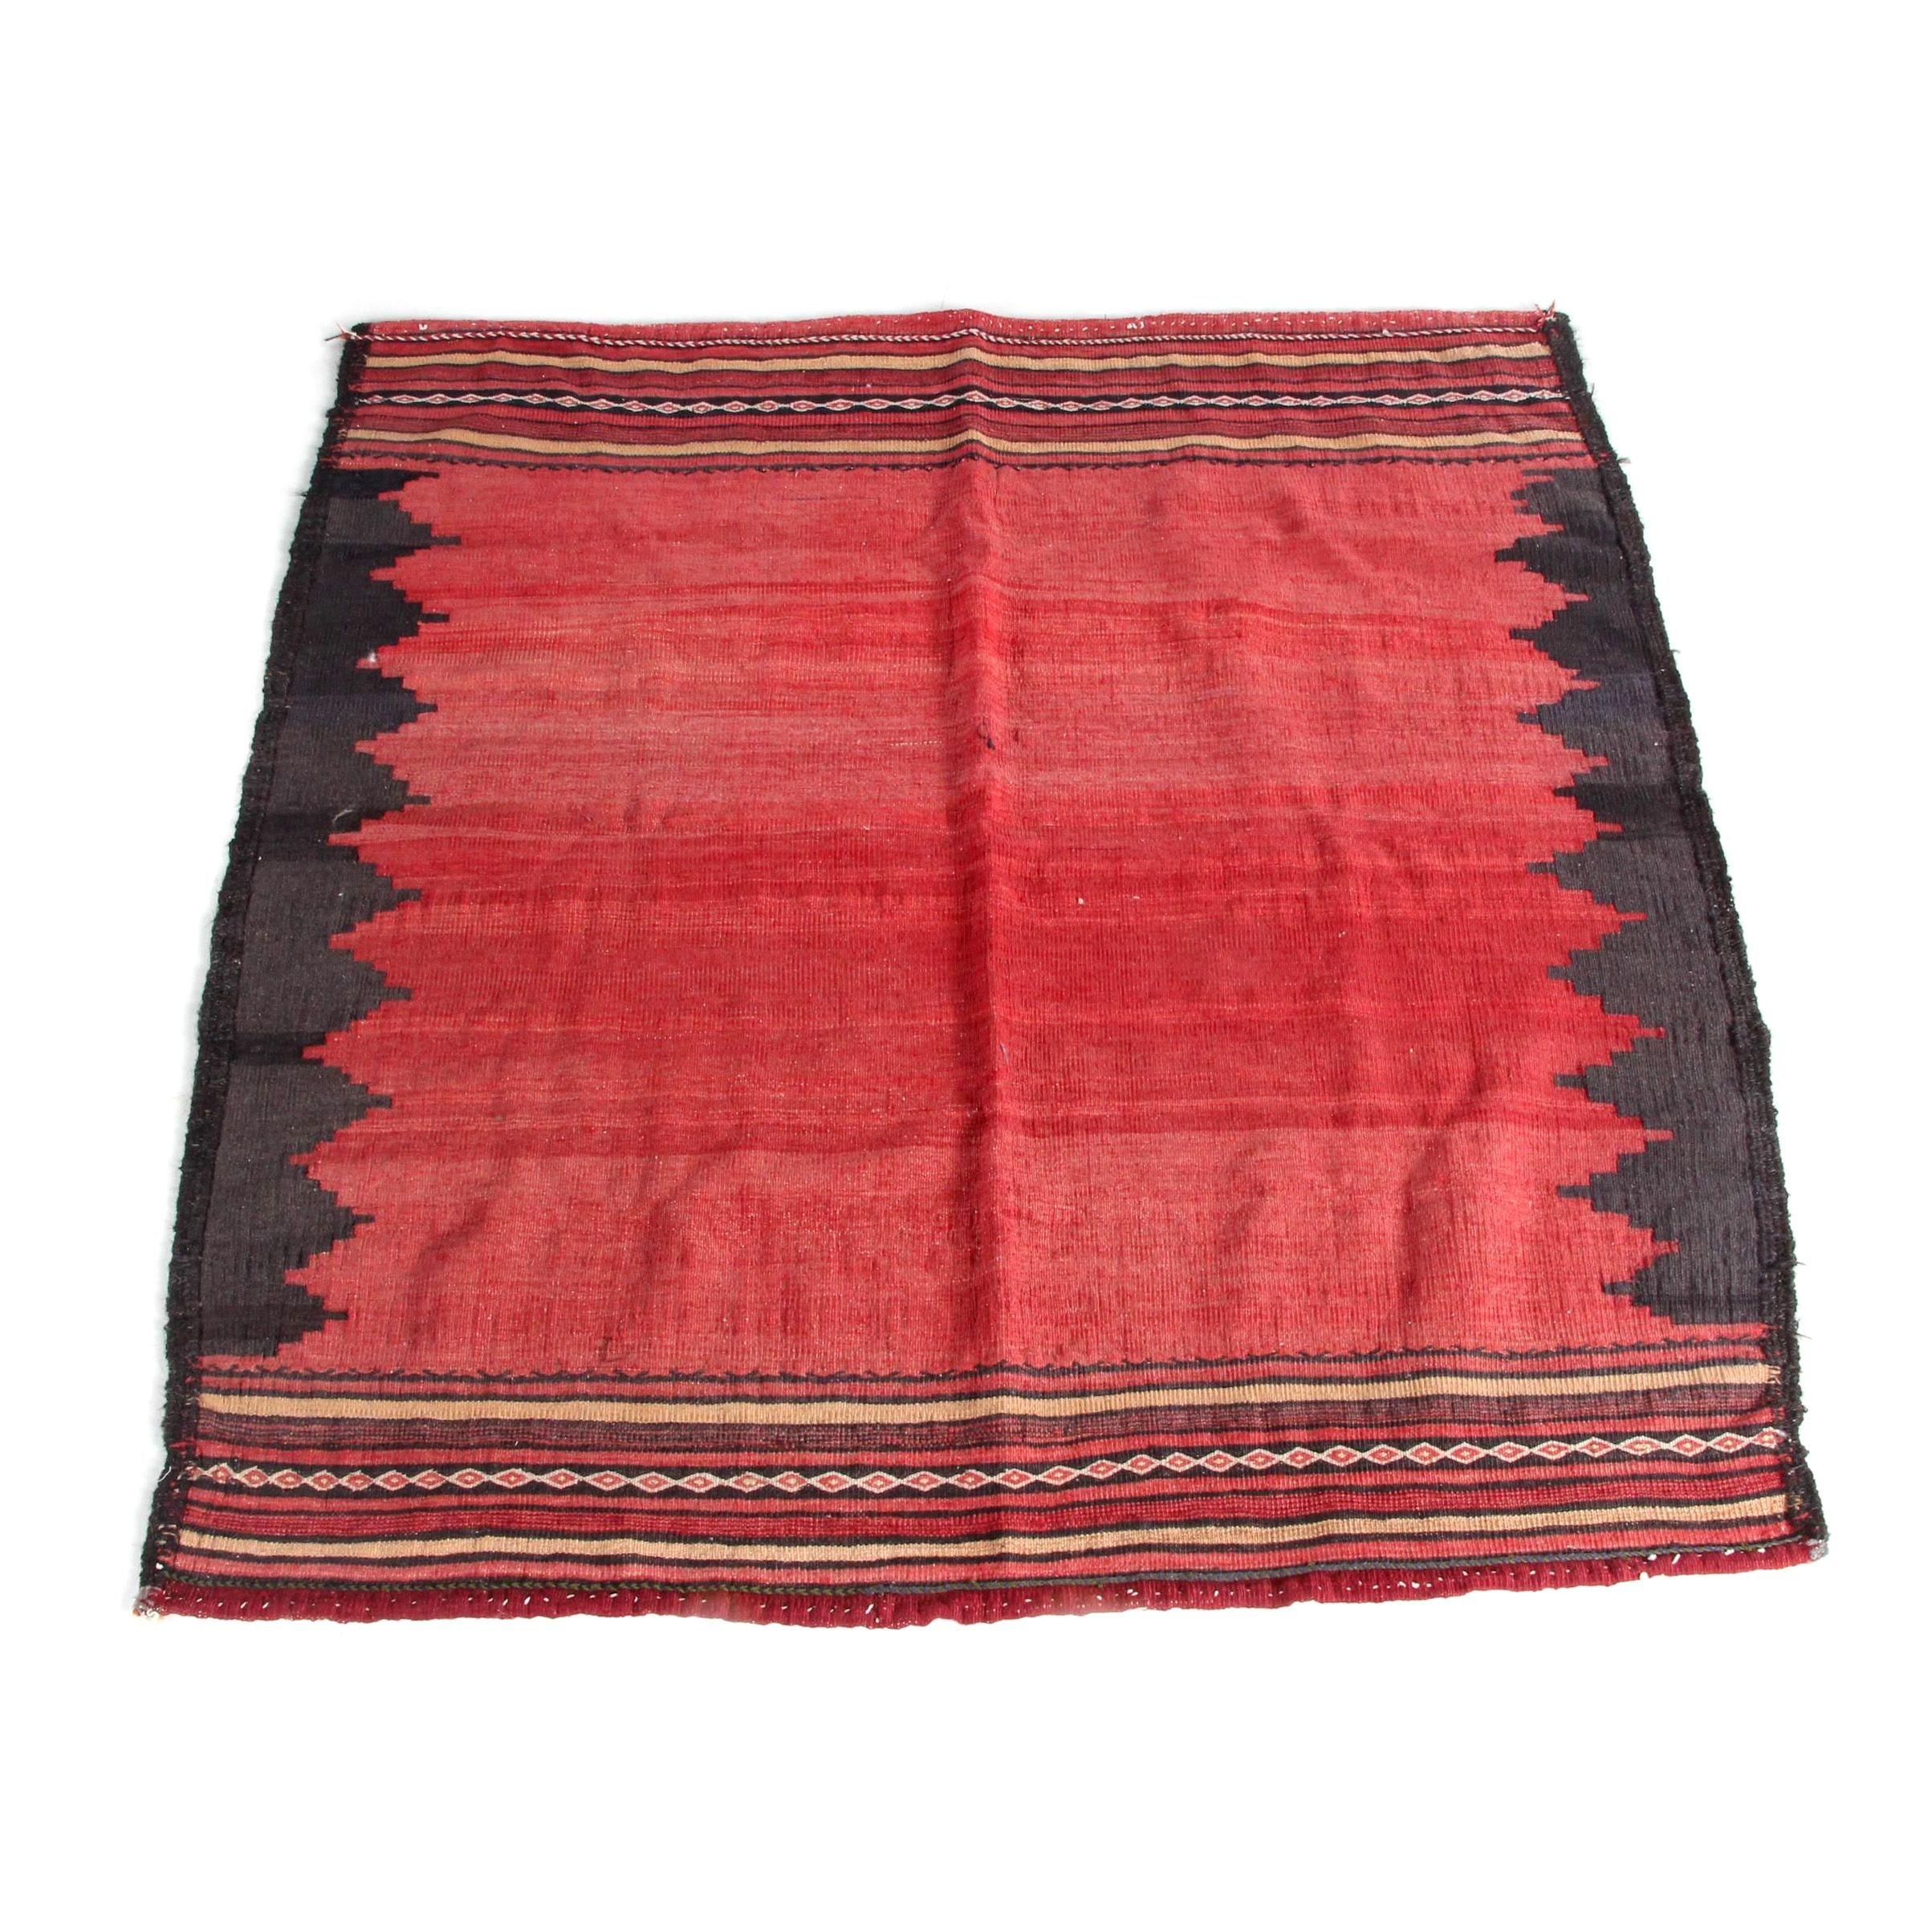 Handwoven Anatolian Wool Accent Rug